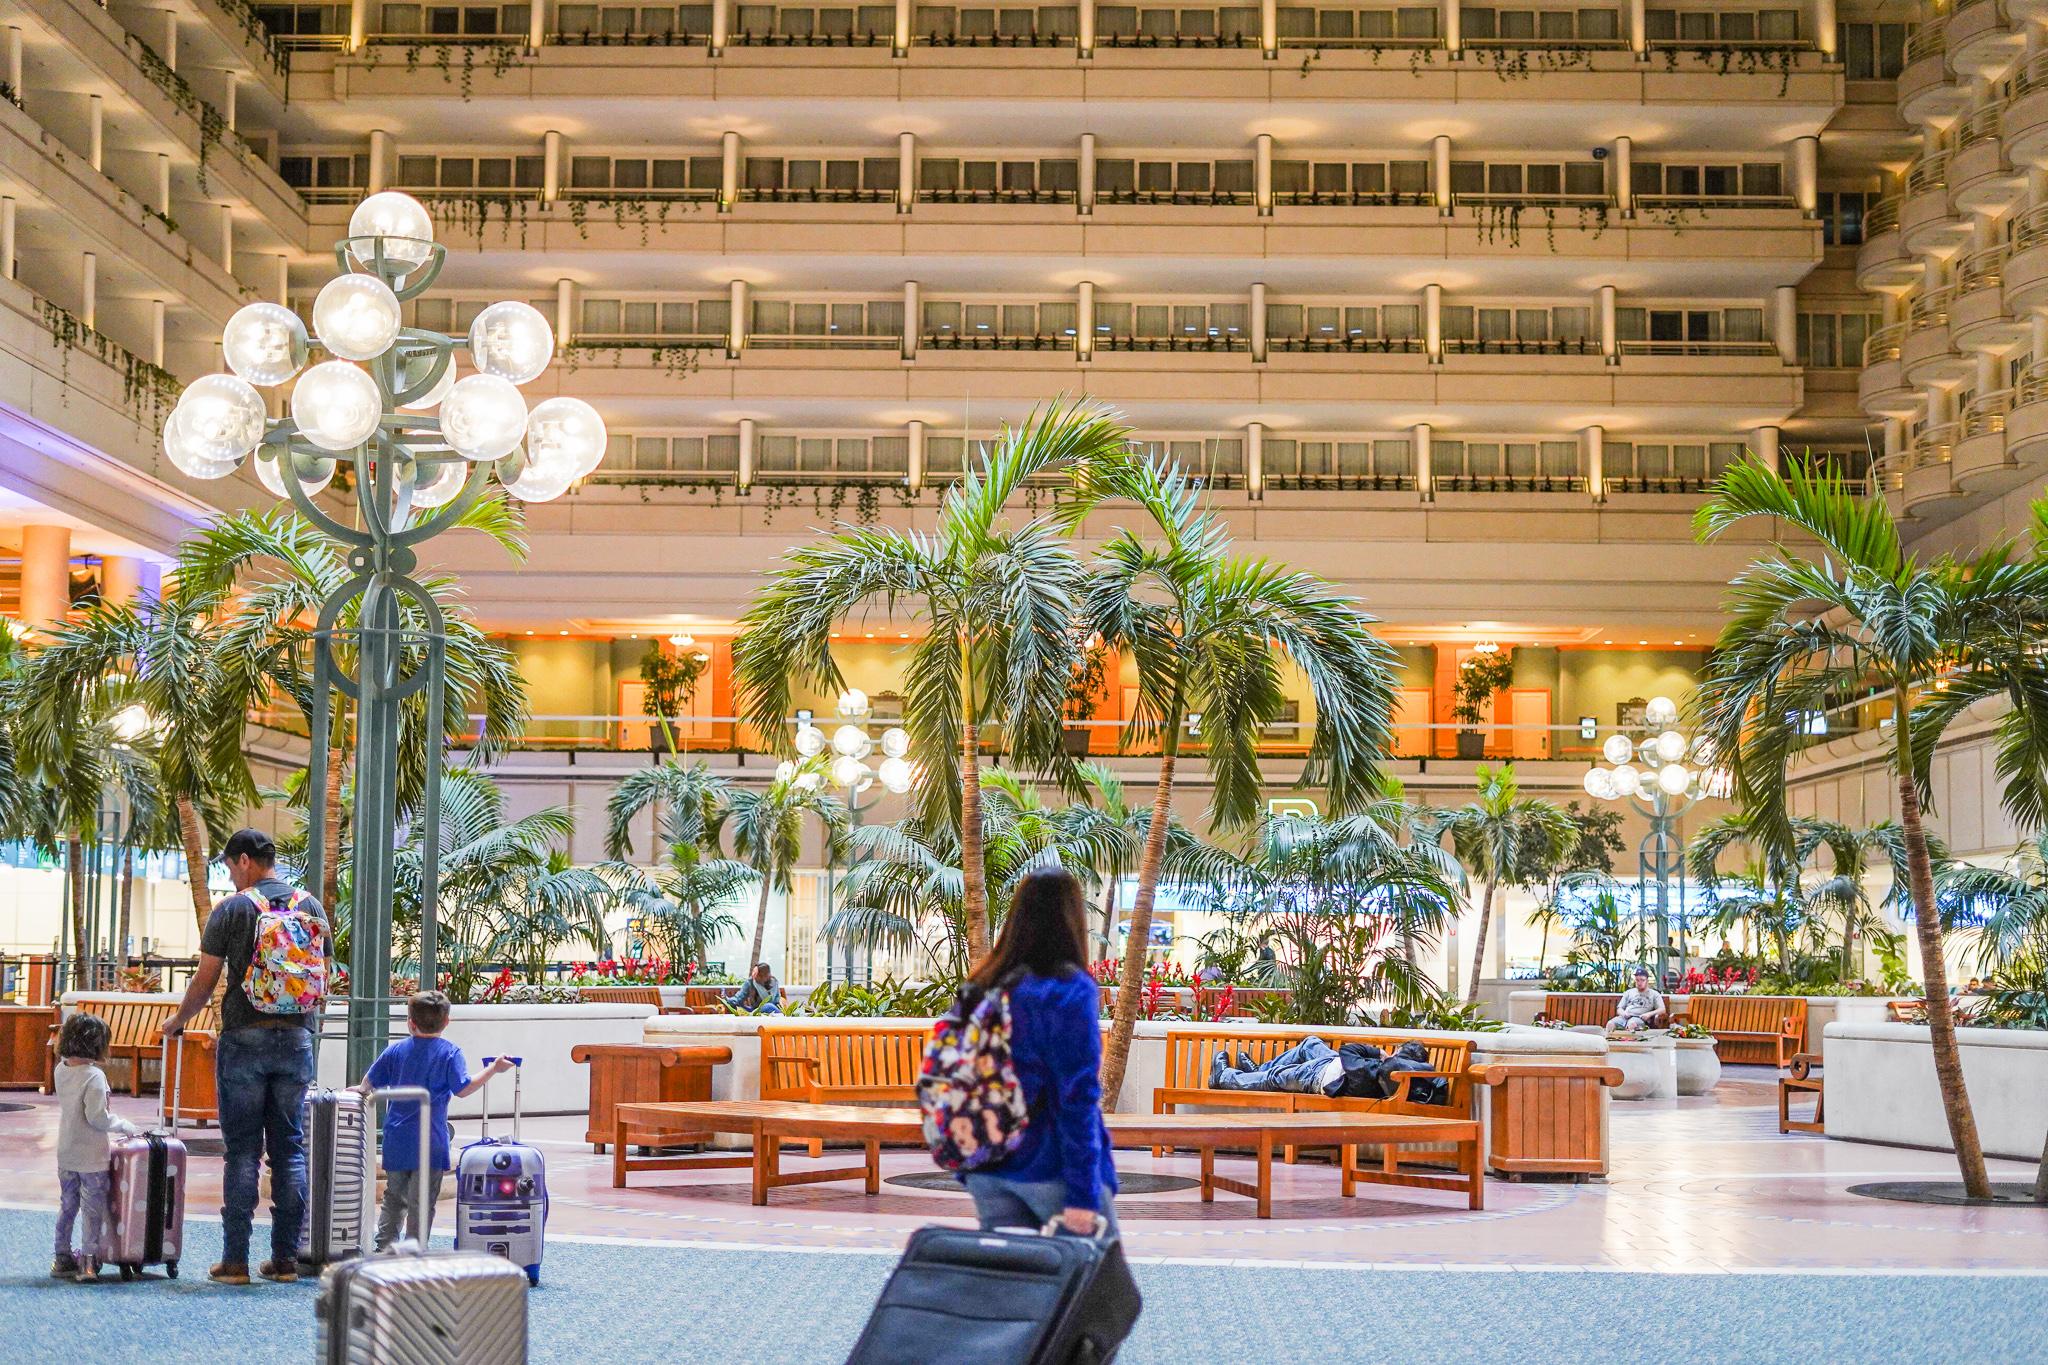 Hotel lobby inside Orlando airport.   Disney Dream Cruise